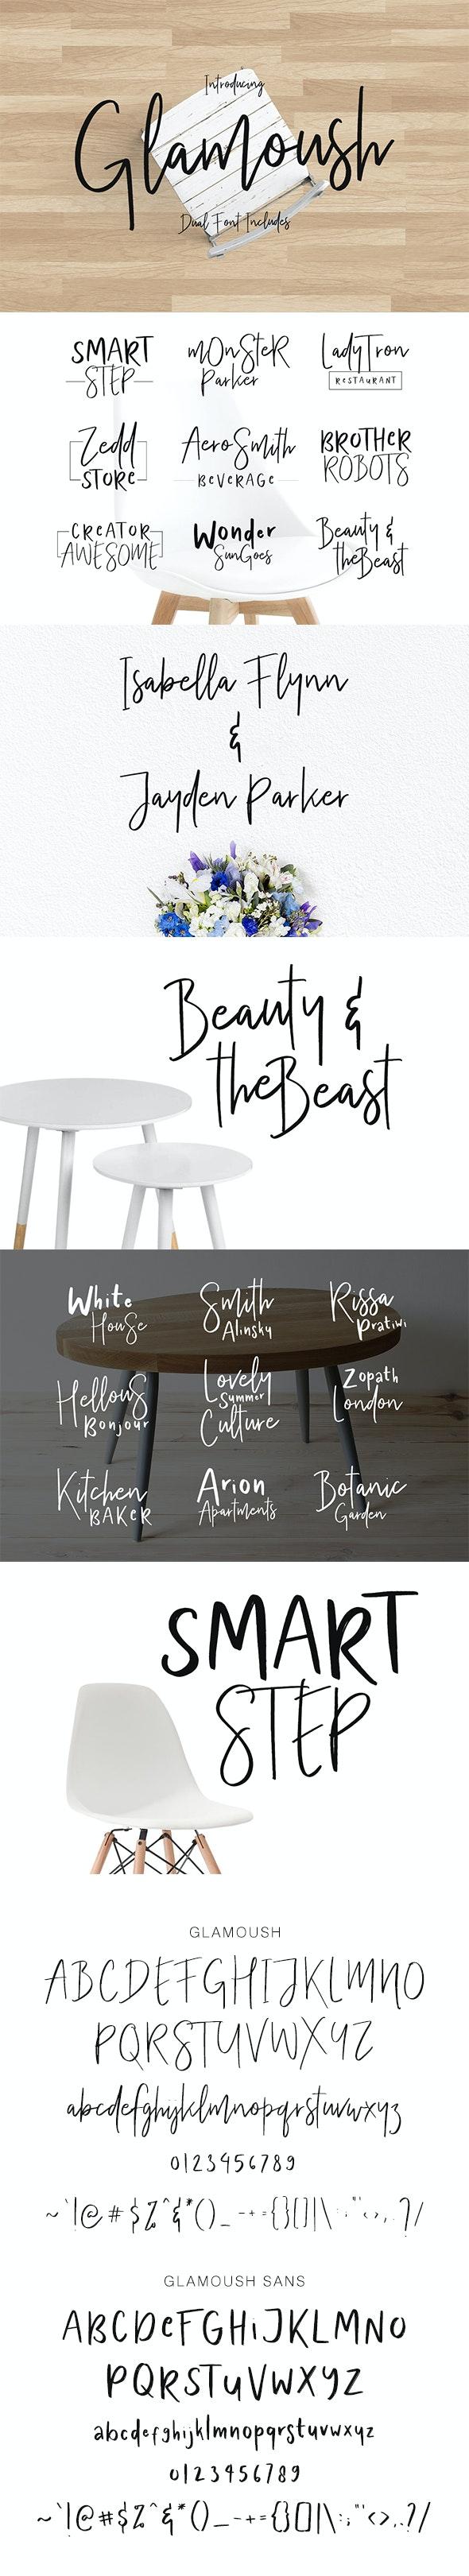 Glamoush Typeface - Cool Fonts